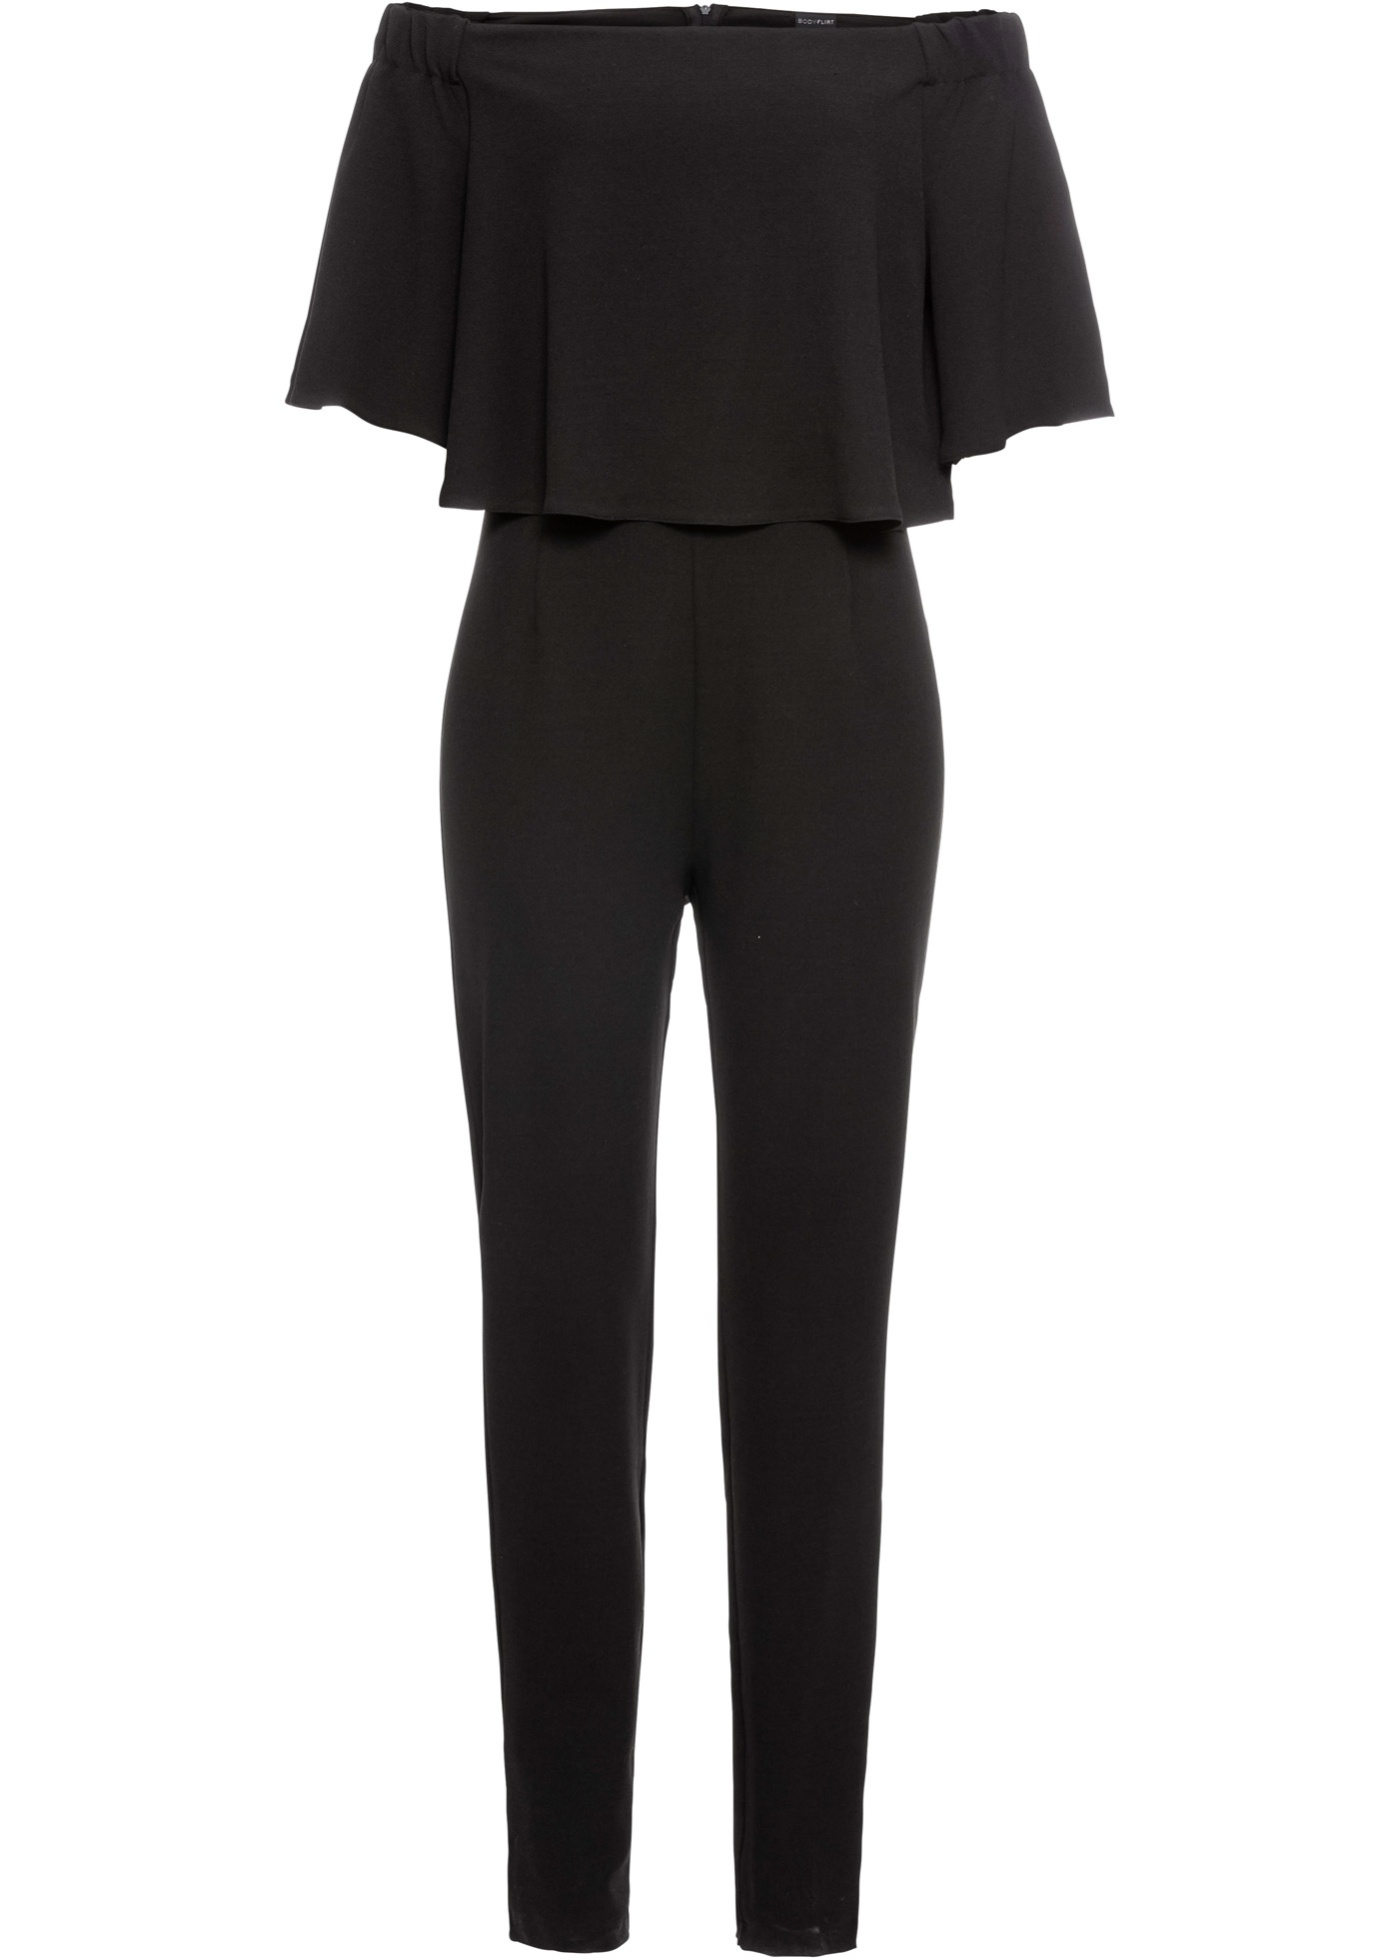 Hosen - Jumpsuit mit Carmen Ausschnitt › bonprix › schwarz  - Onlineshop Bonprix